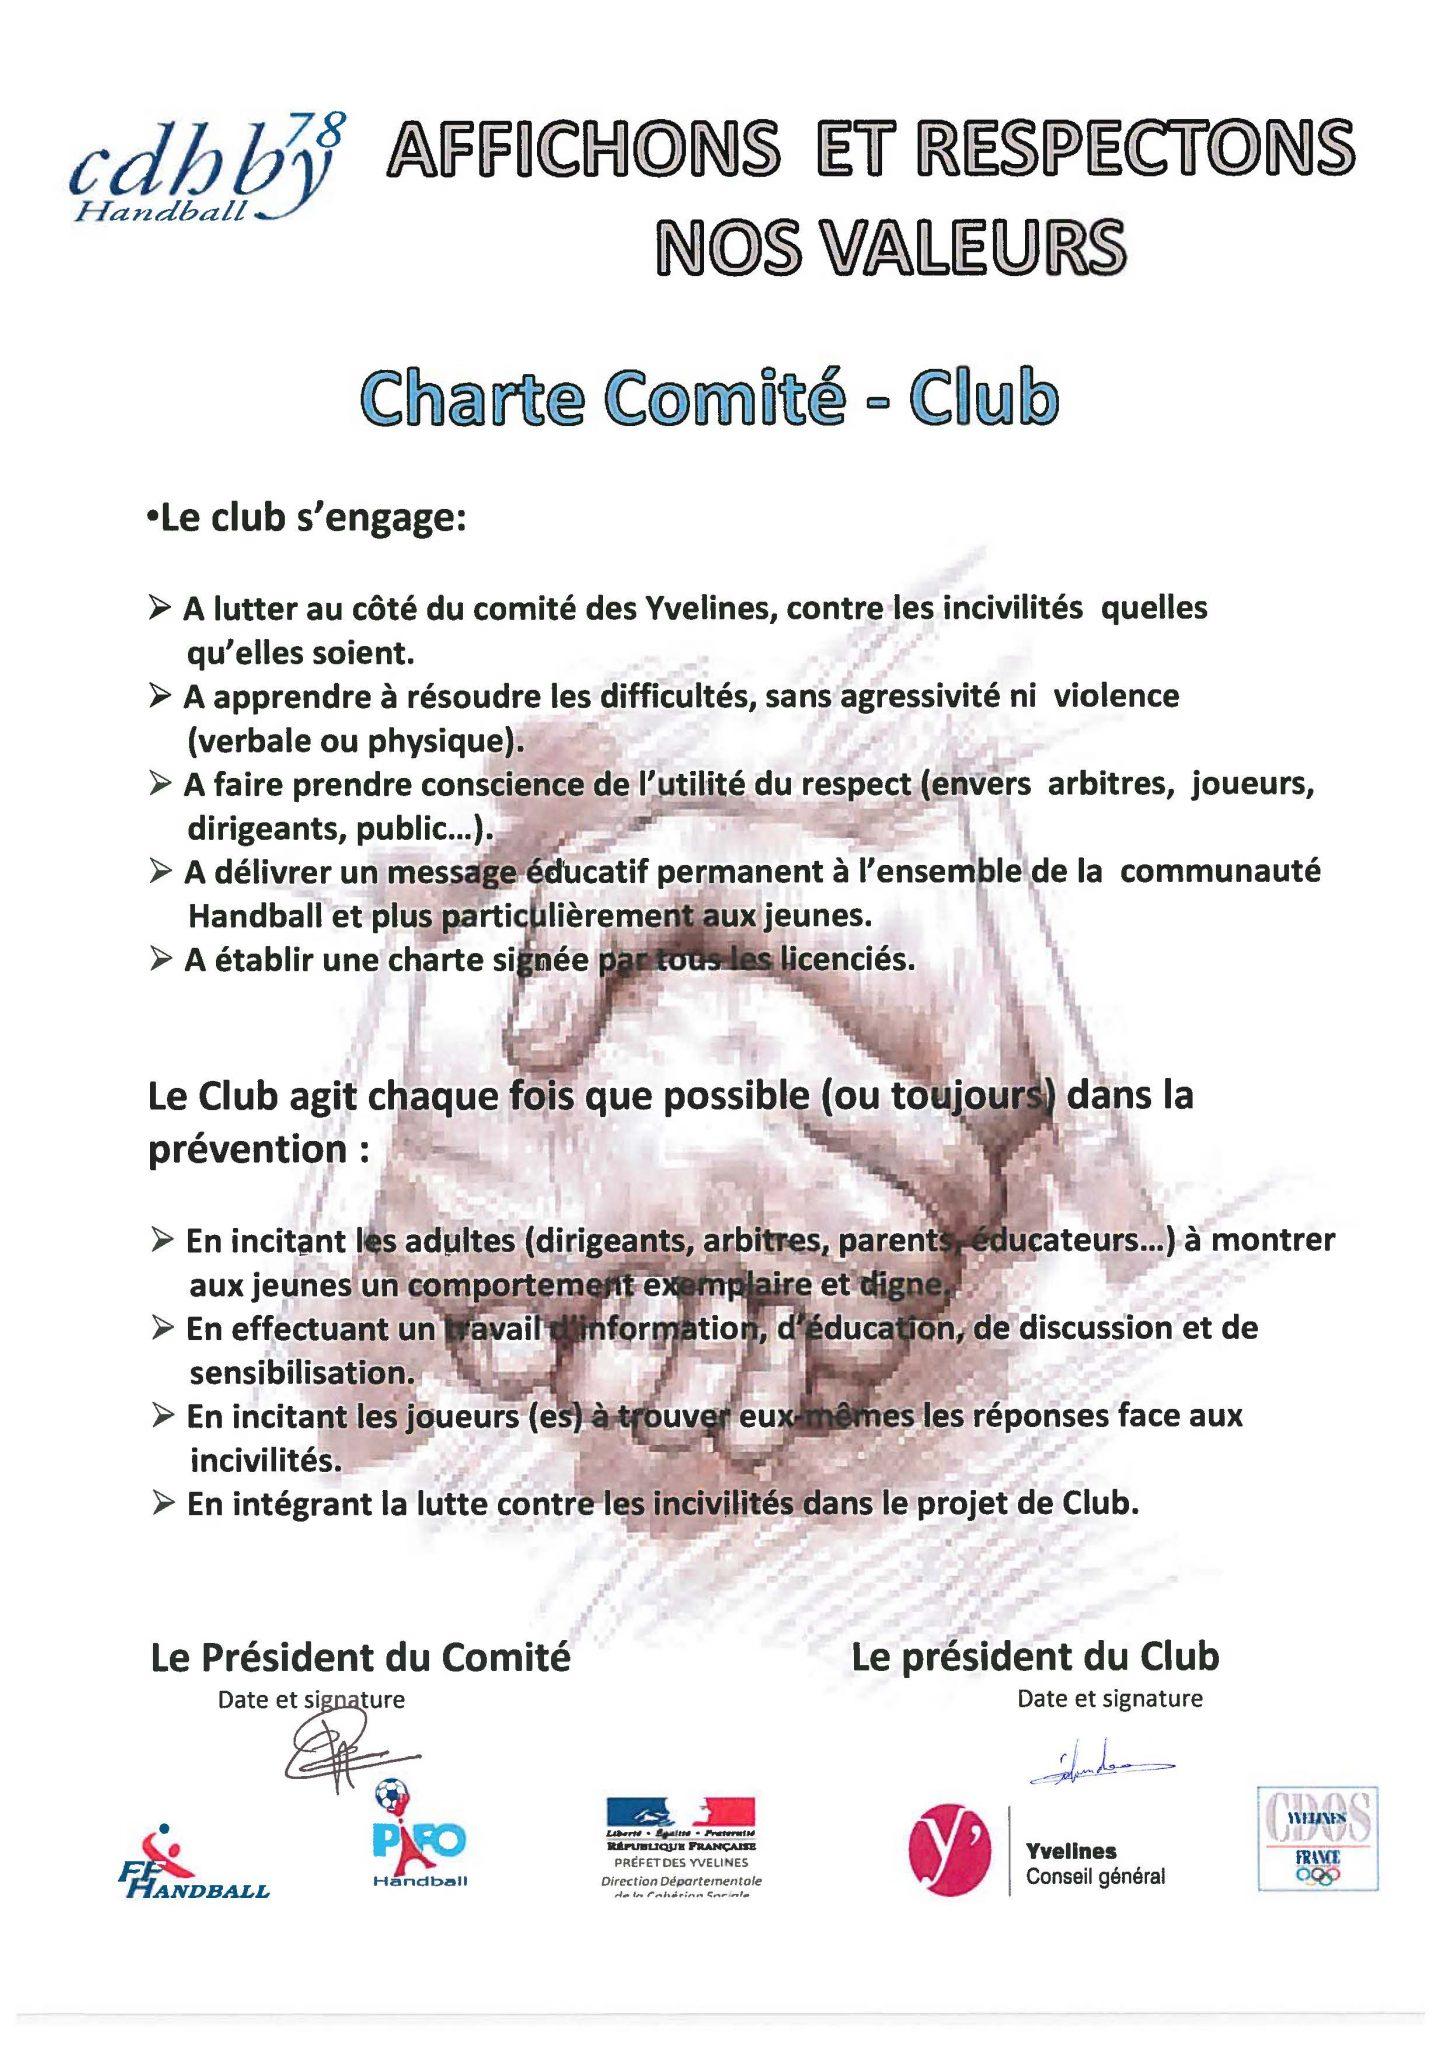 Charte Comite Club